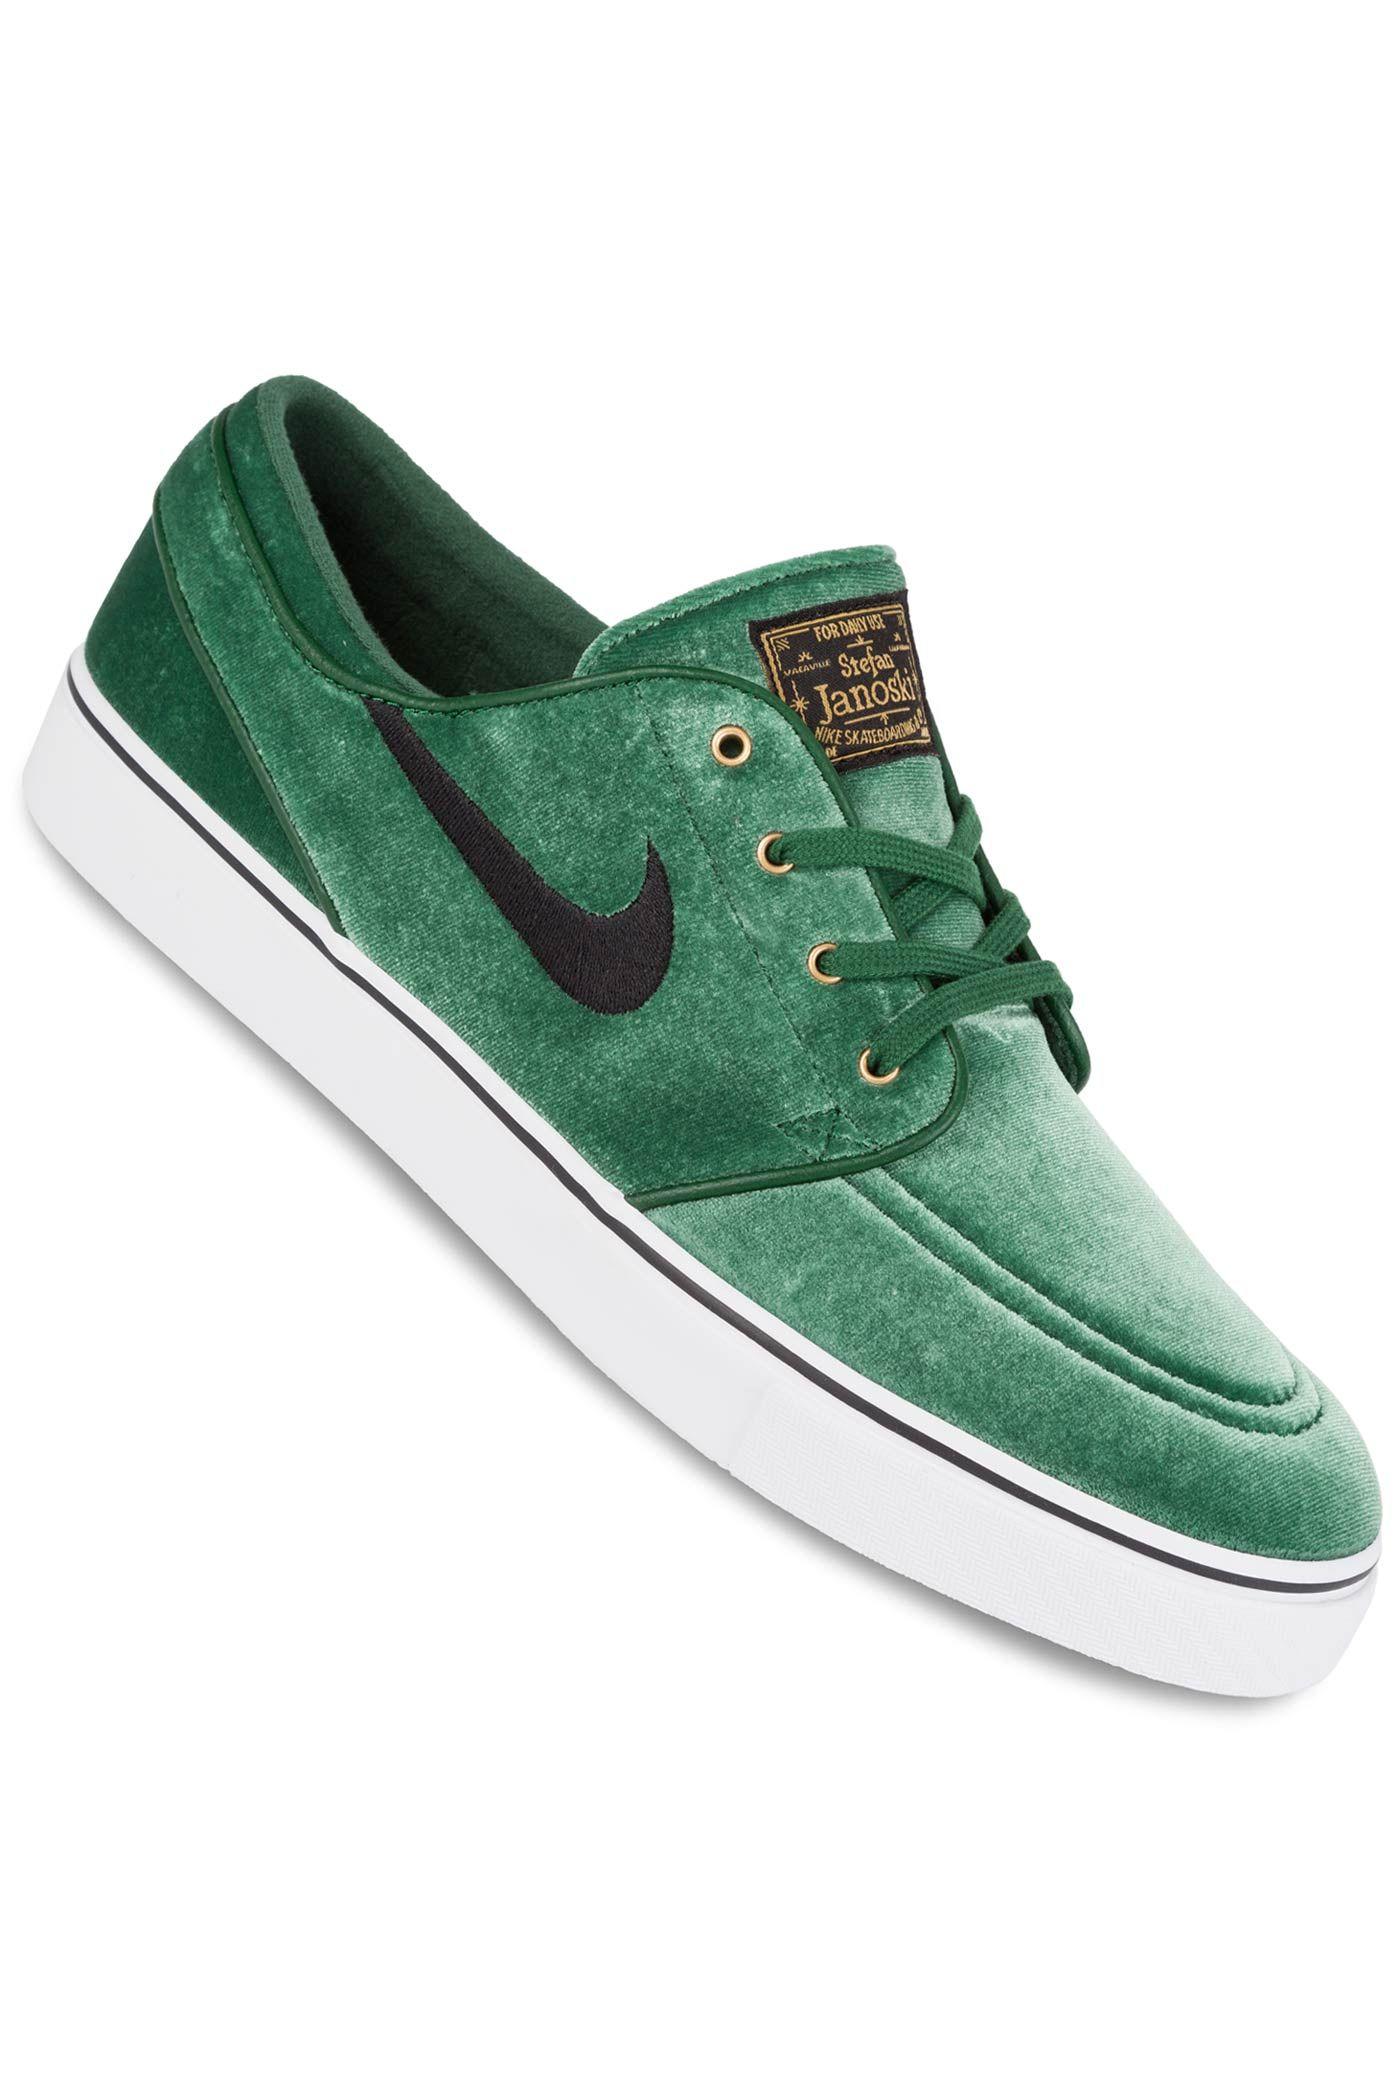 Nike SB Zoom Stefan Janoski Premium TXT Mens Green